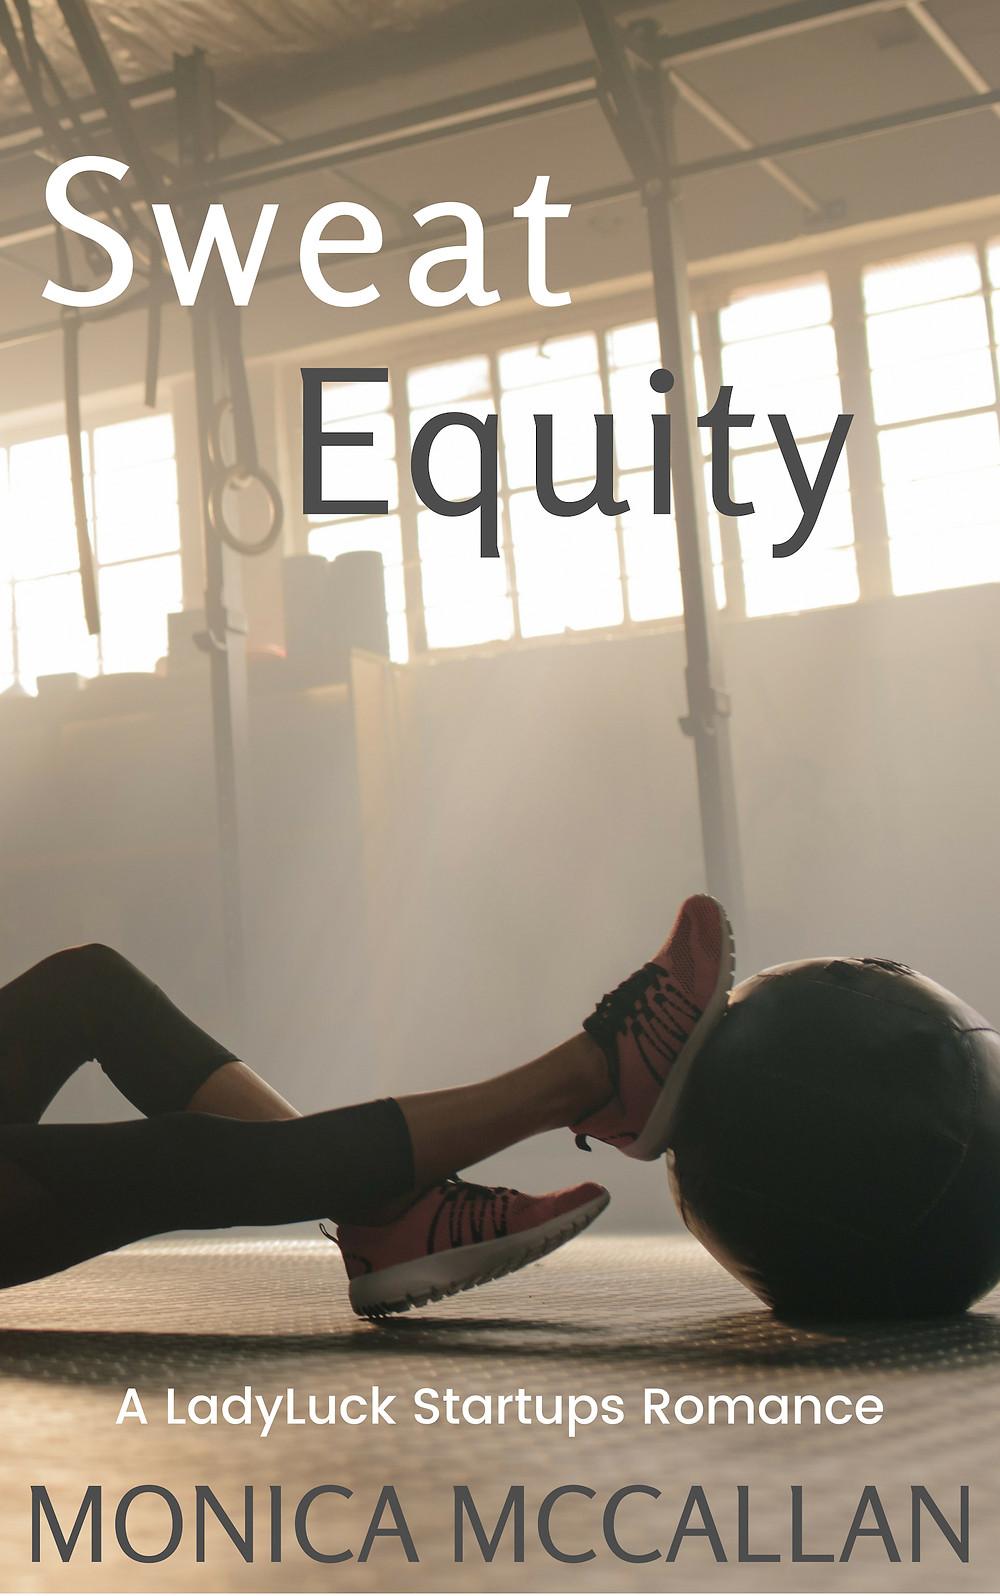 Sweat Equity - A LadyLuck Startups Romance